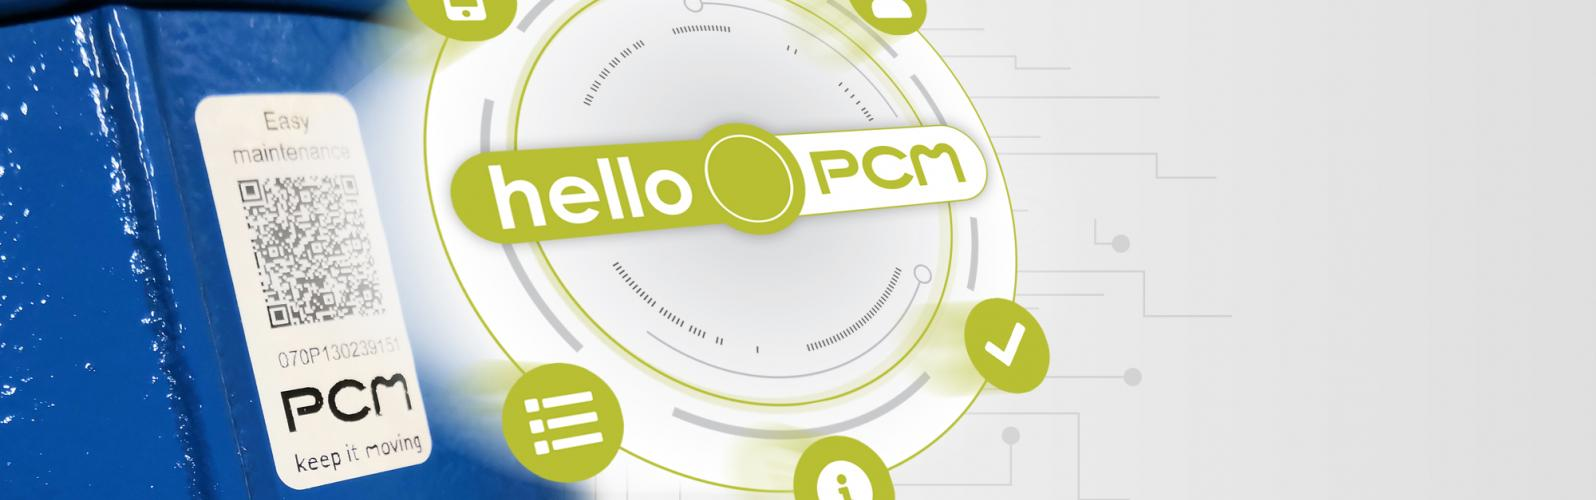 Hello PCM - Digital application